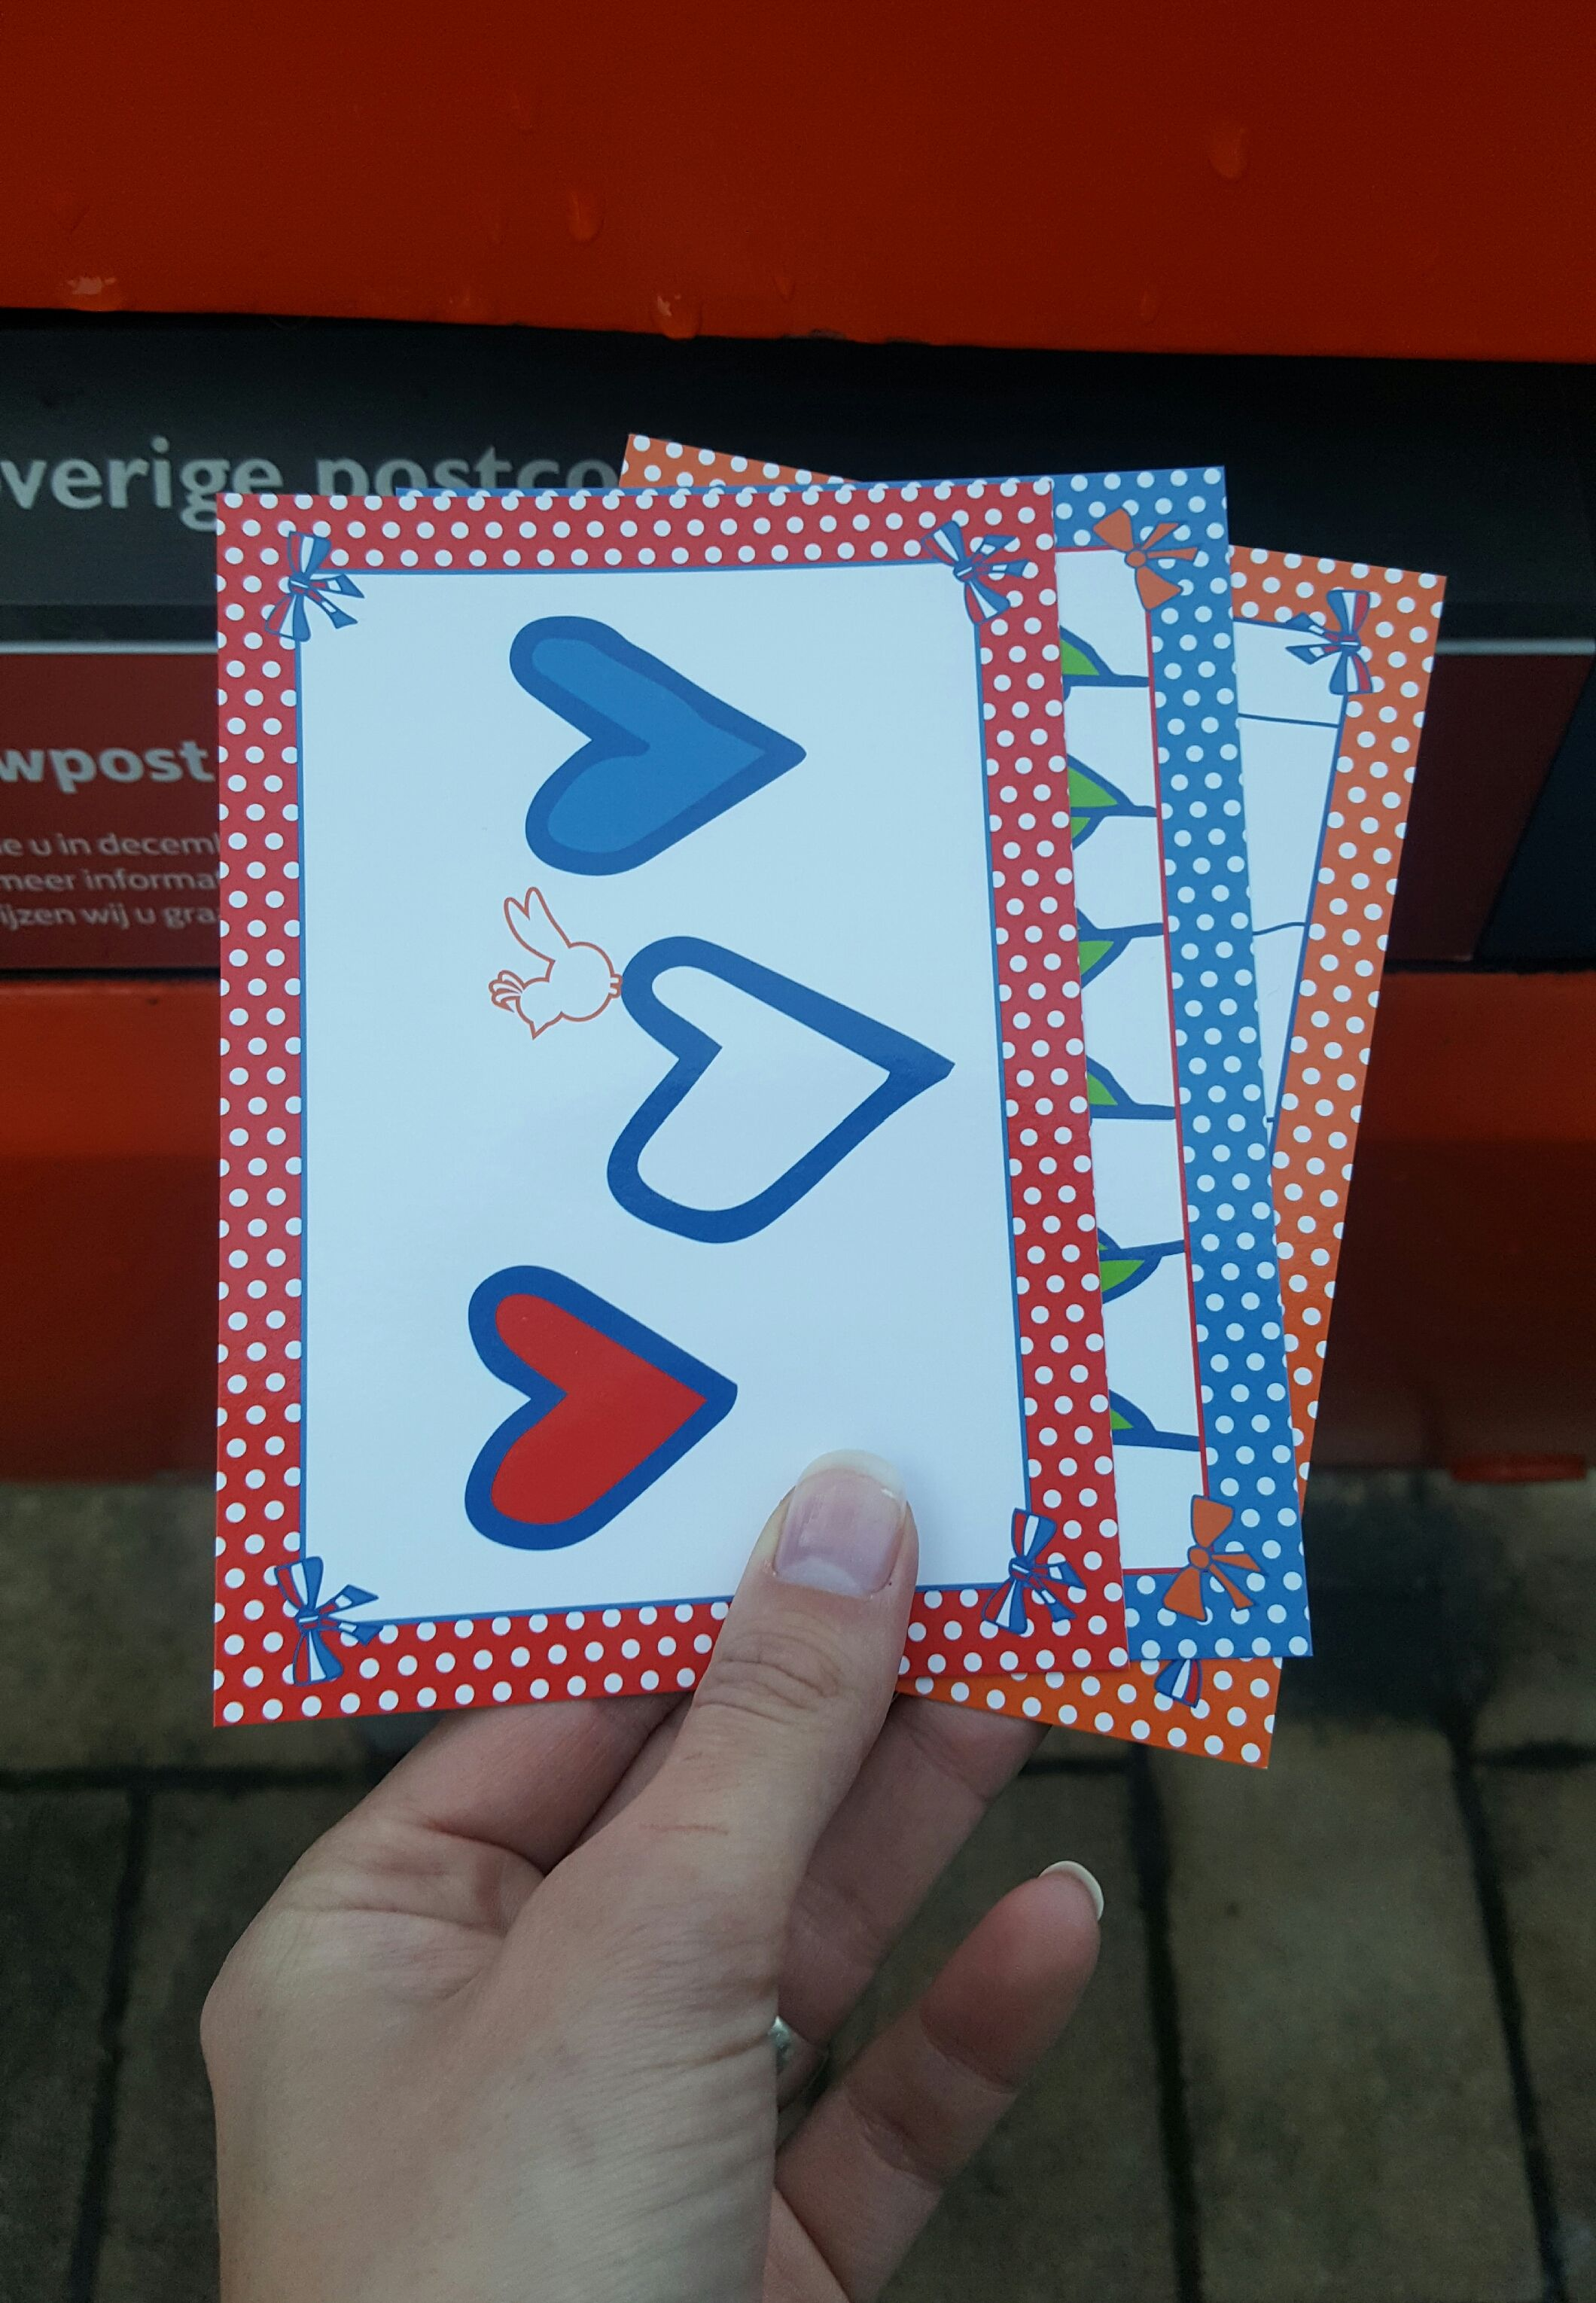 Blog Postcrossing #blogger #kaarten #brievenbus #postcrossing #post #NL